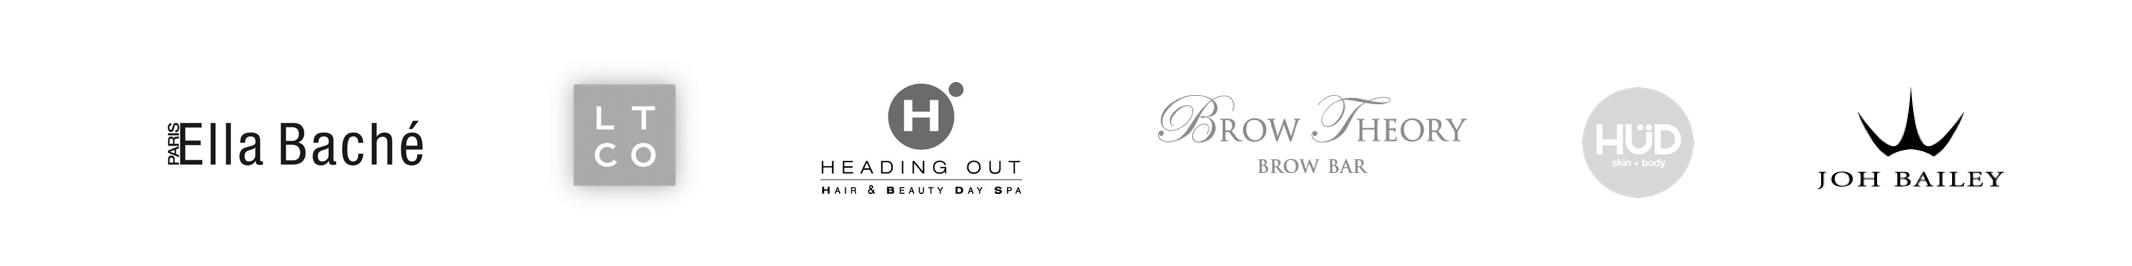 Beauro-app-salon-partners.png